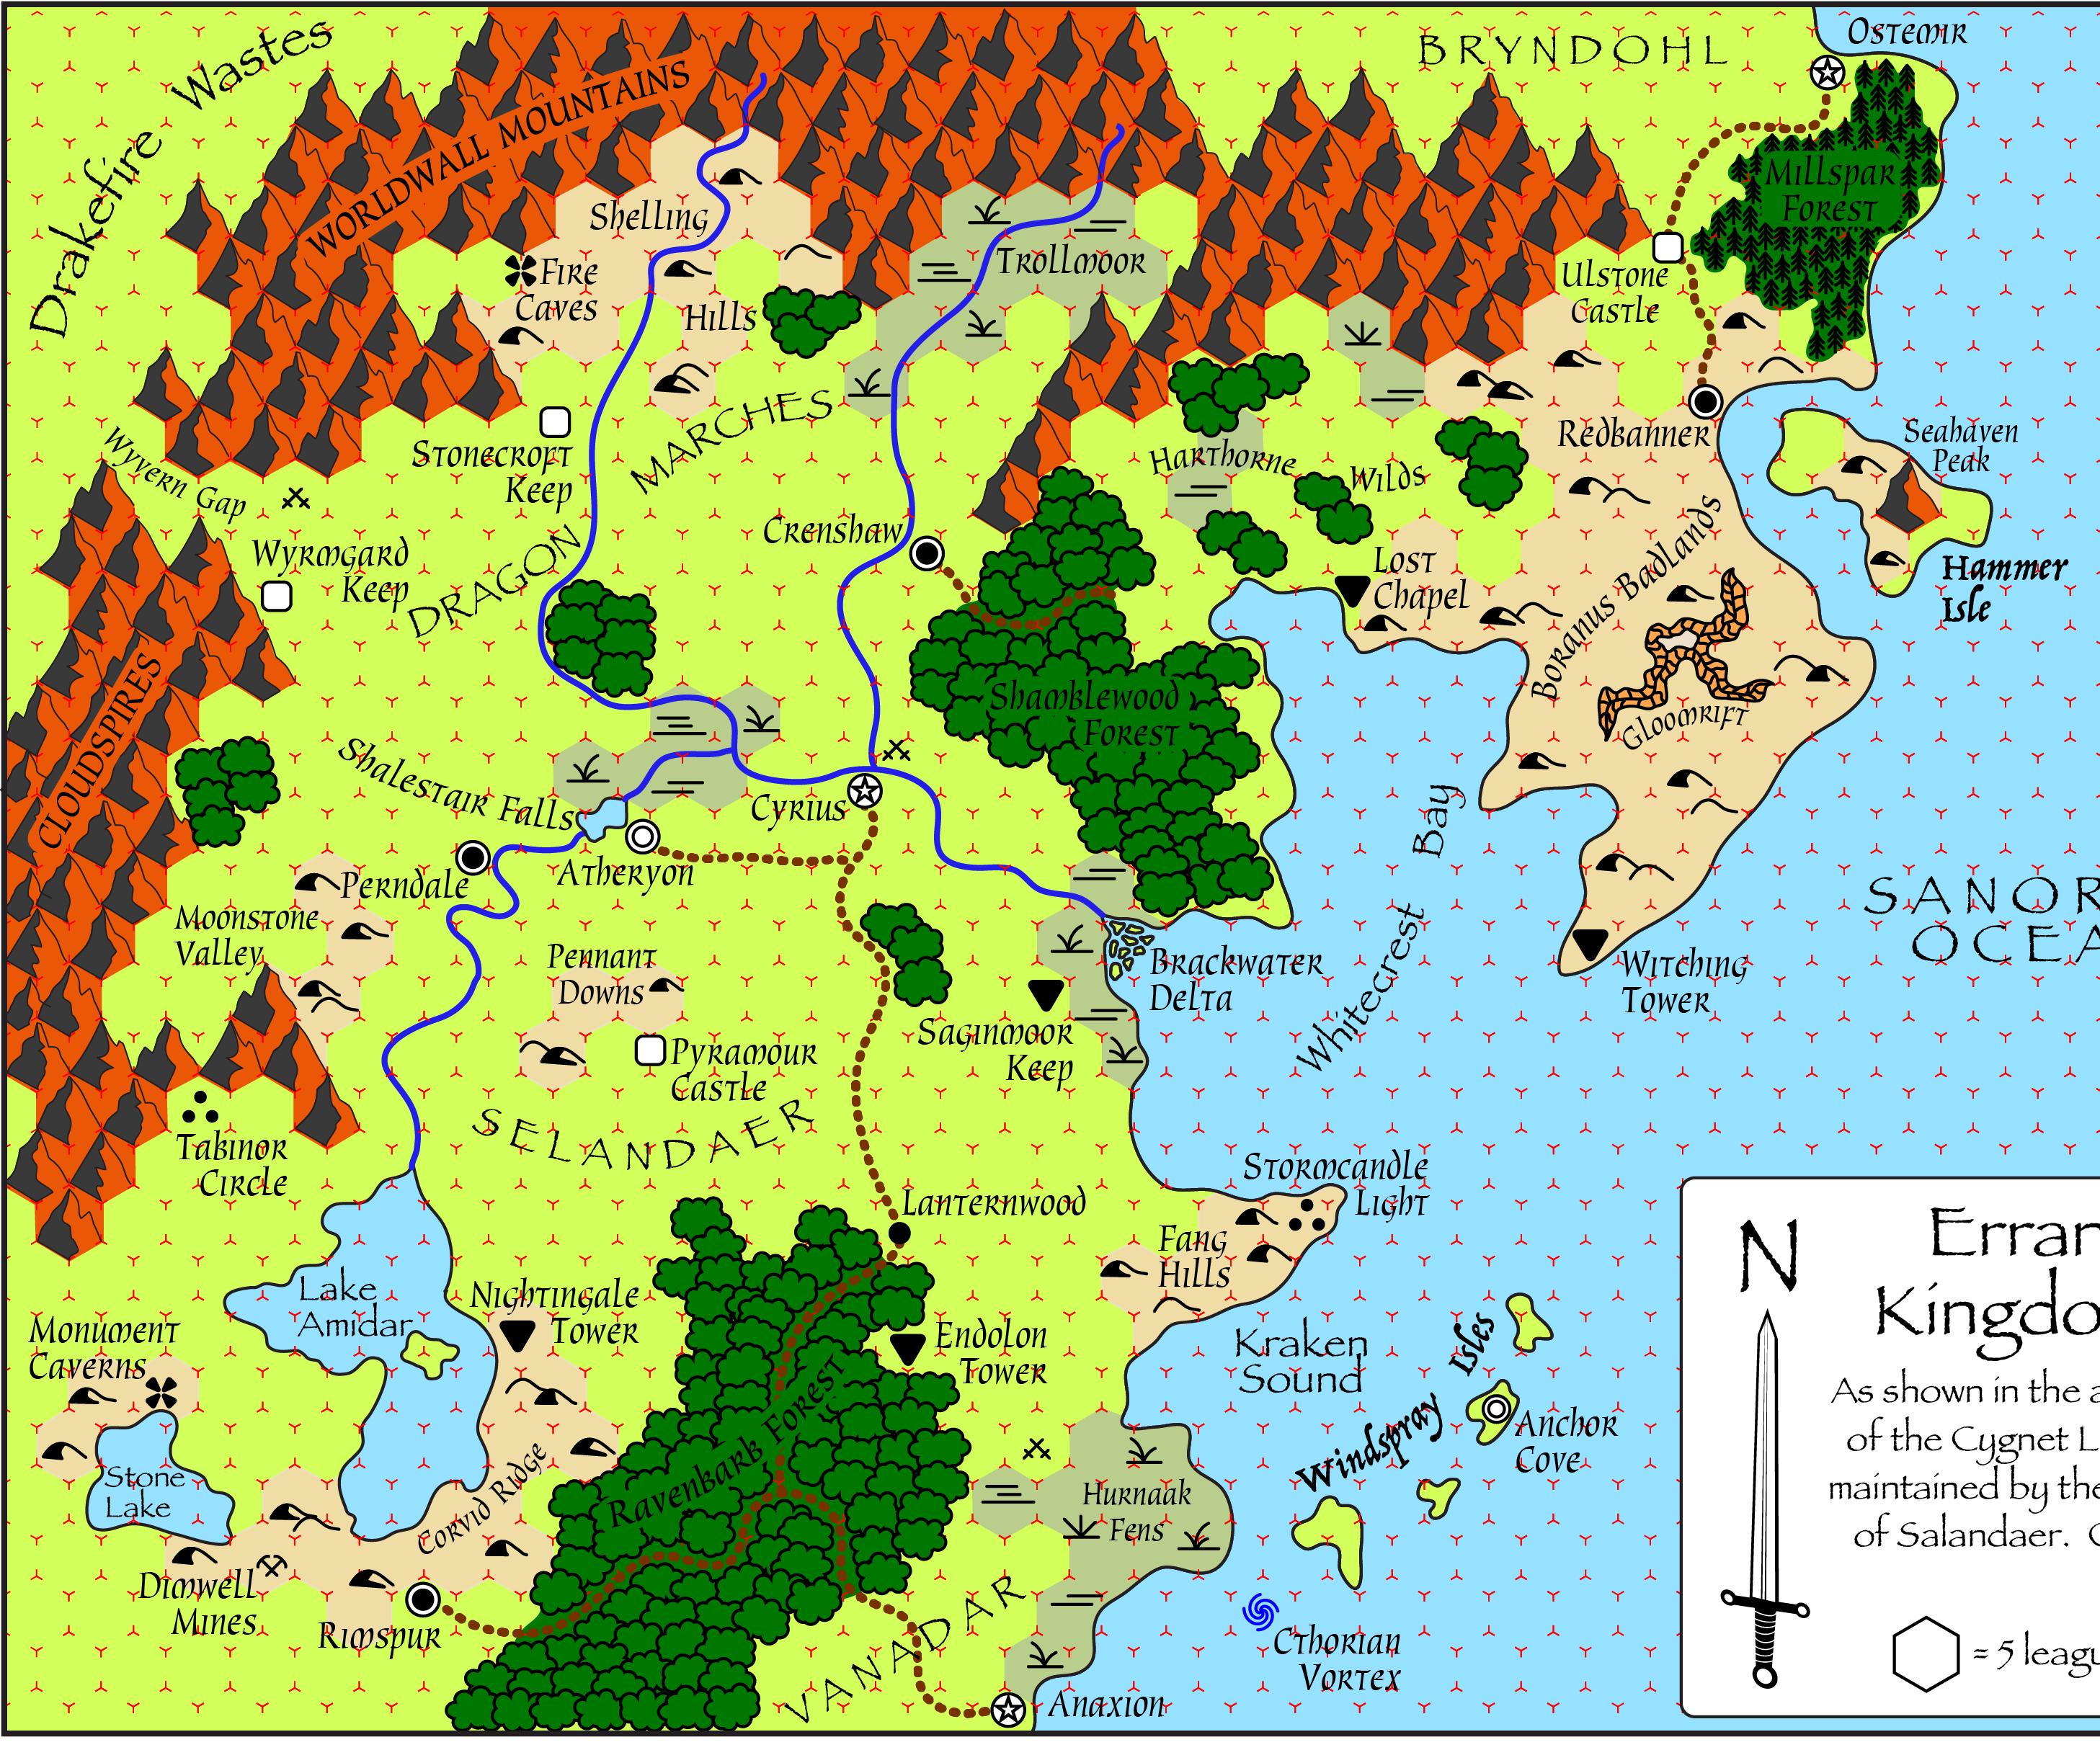 Fanatsy World/RPG Maps (Darlene Style)